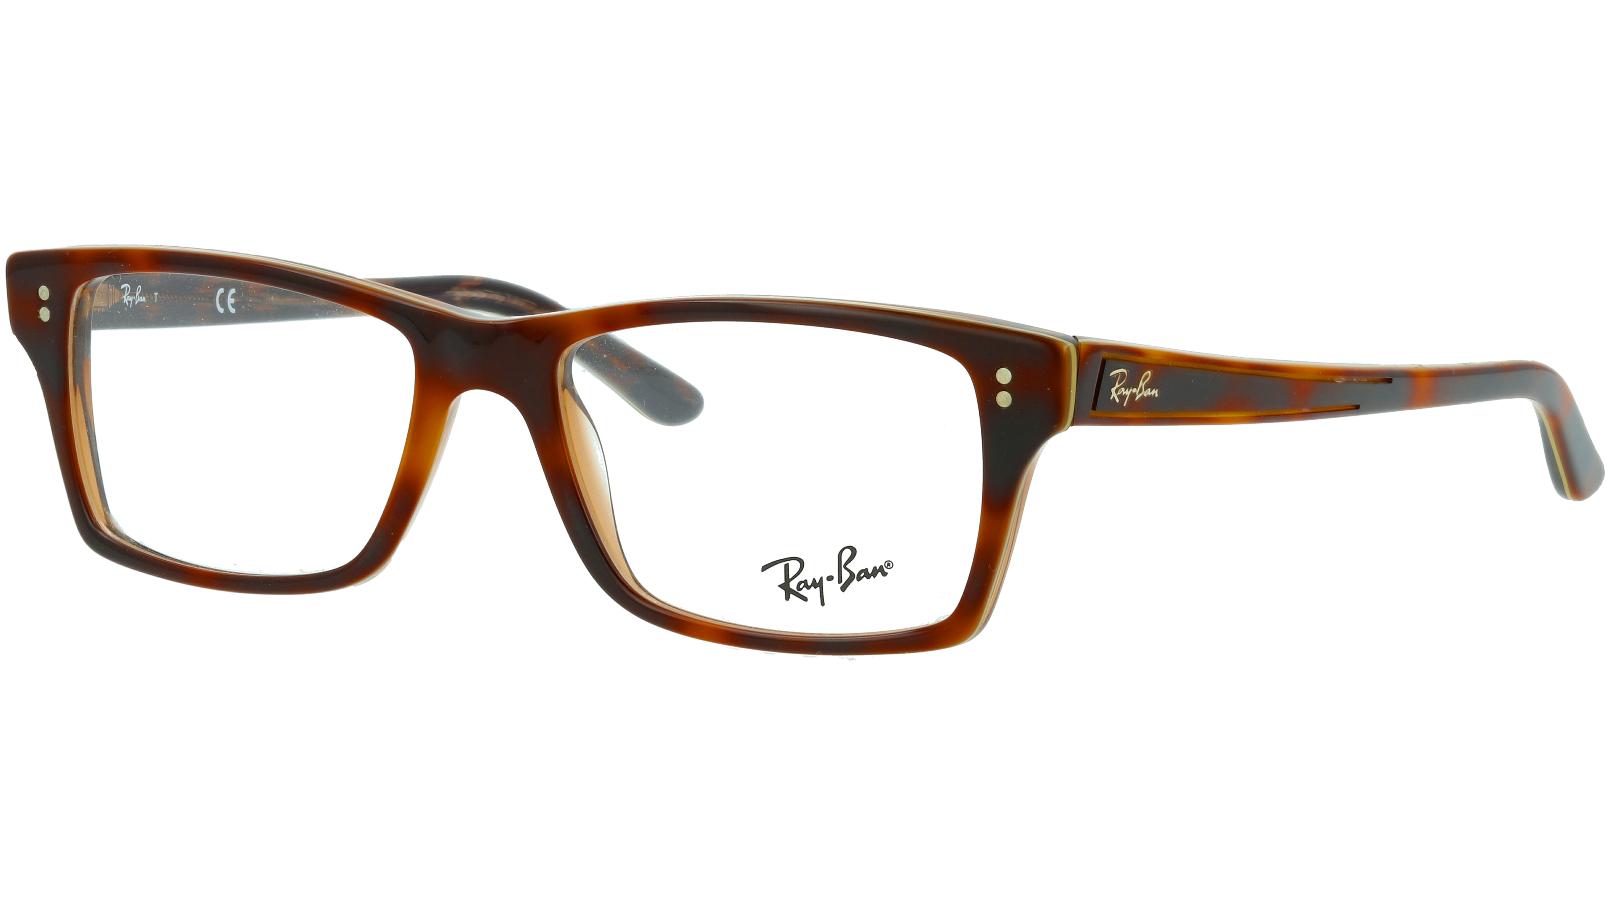 Ray-Ban RB5225 5036 52 HAVANA Glasses